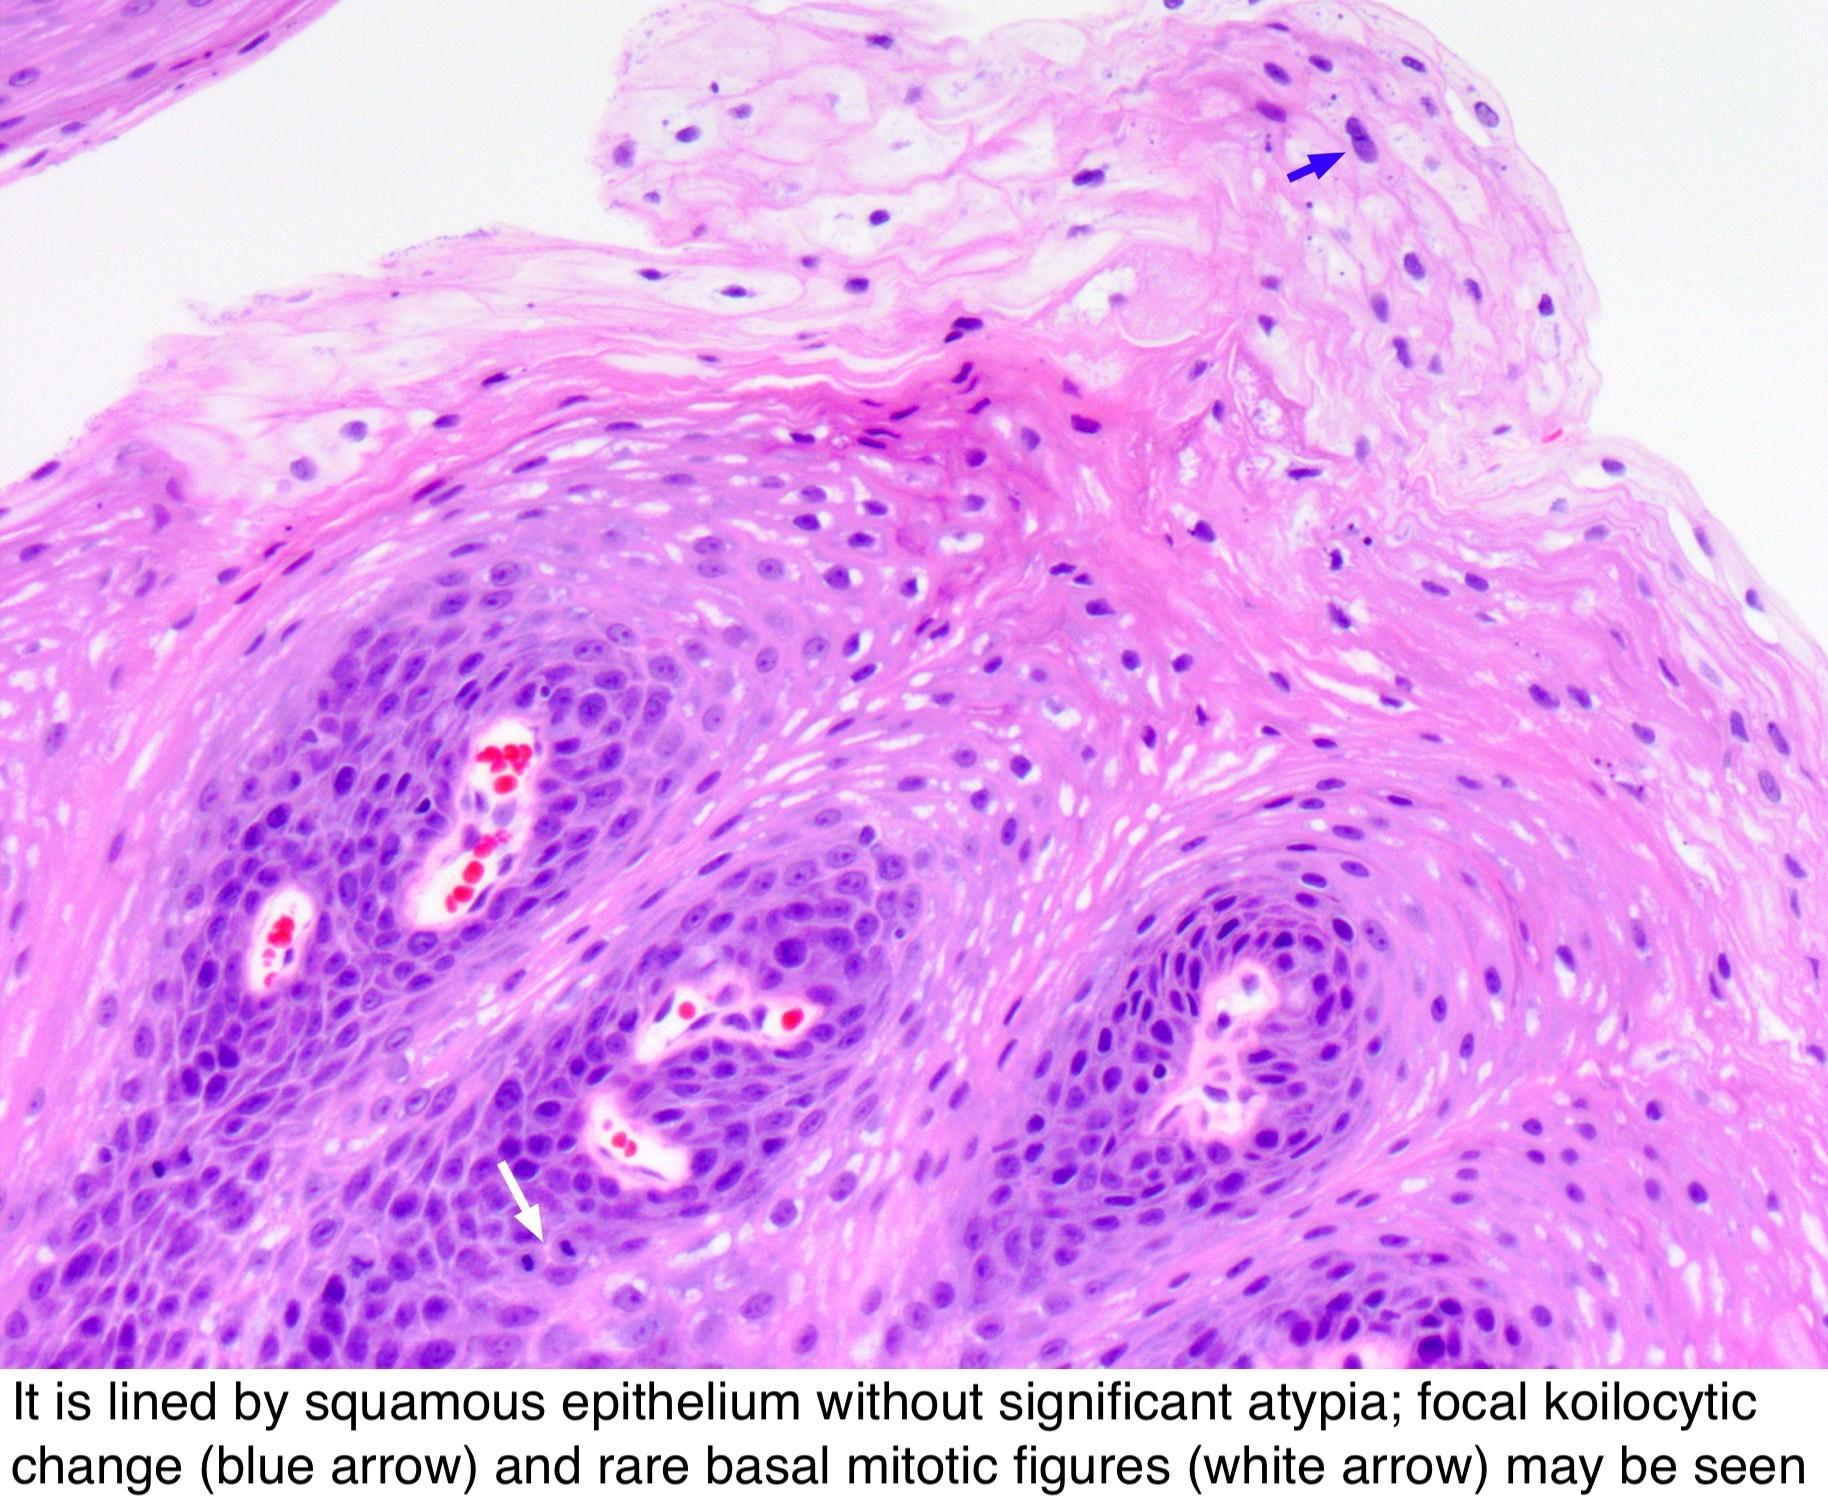 sinonasal papilloma inverted type schistosomiasis qualitative study